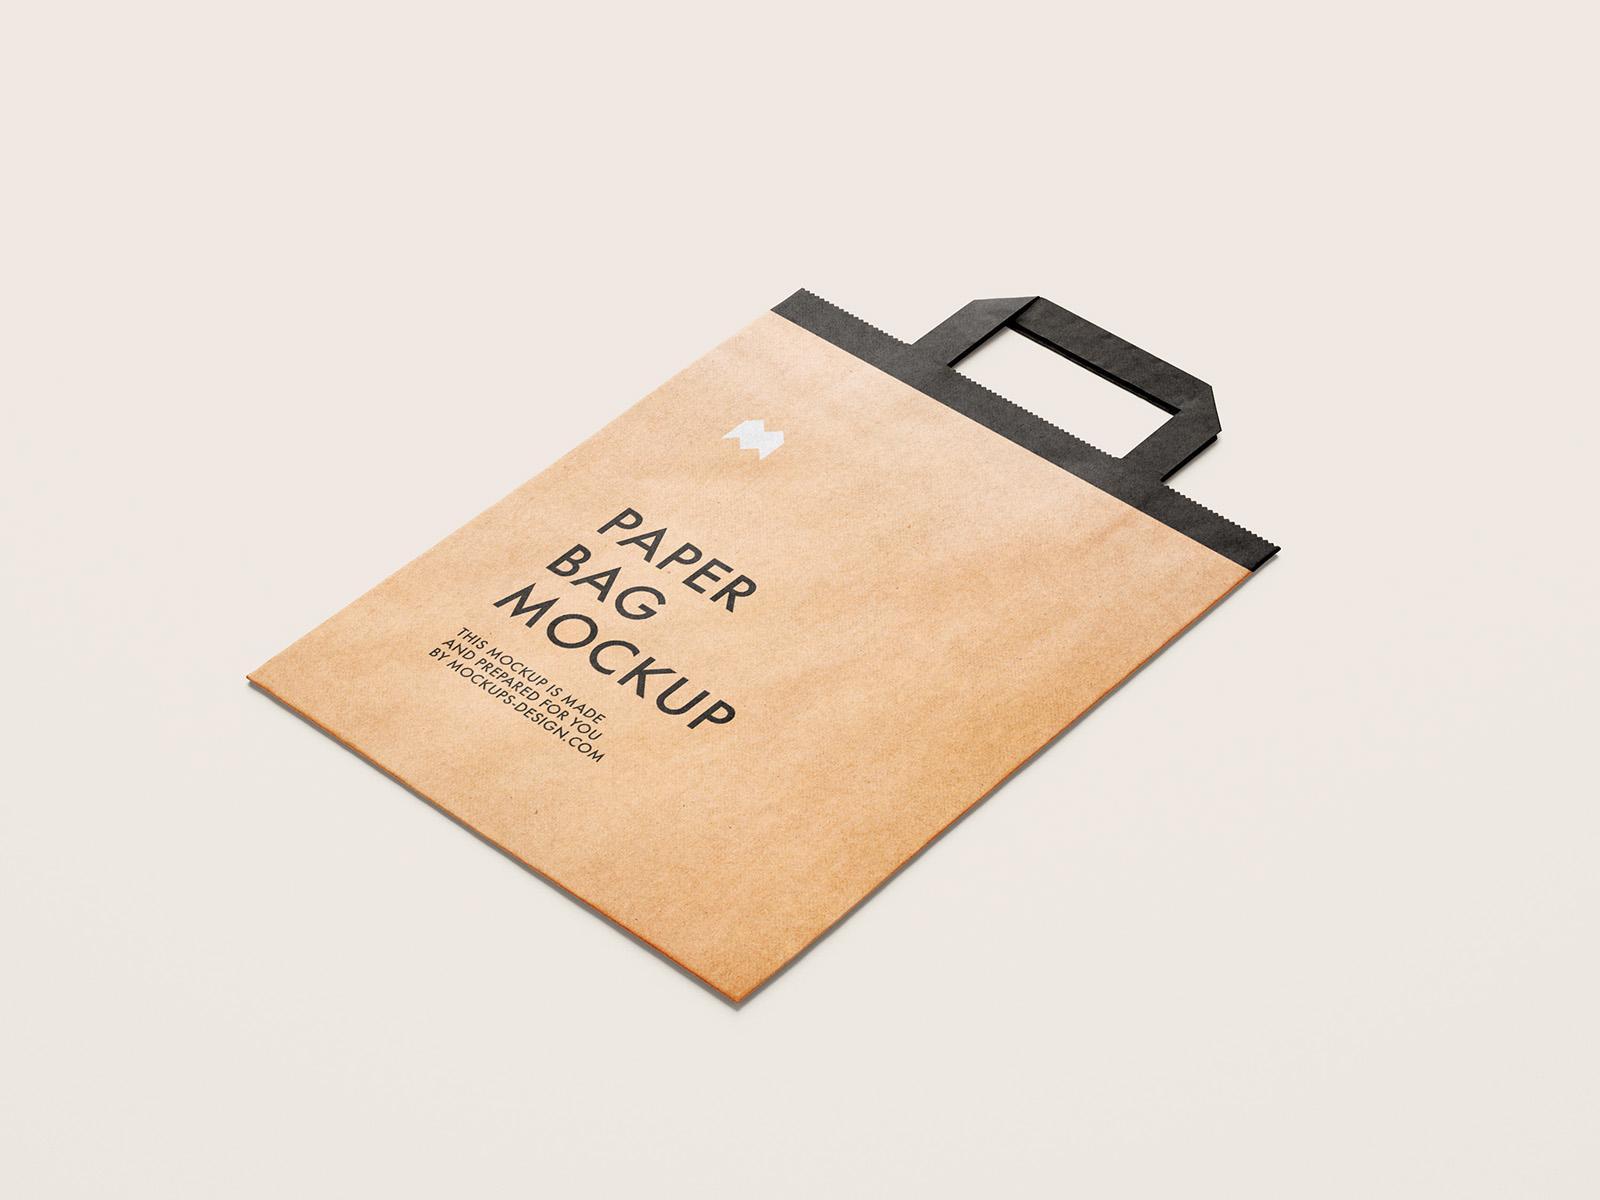 Free flattened paper bag mockup